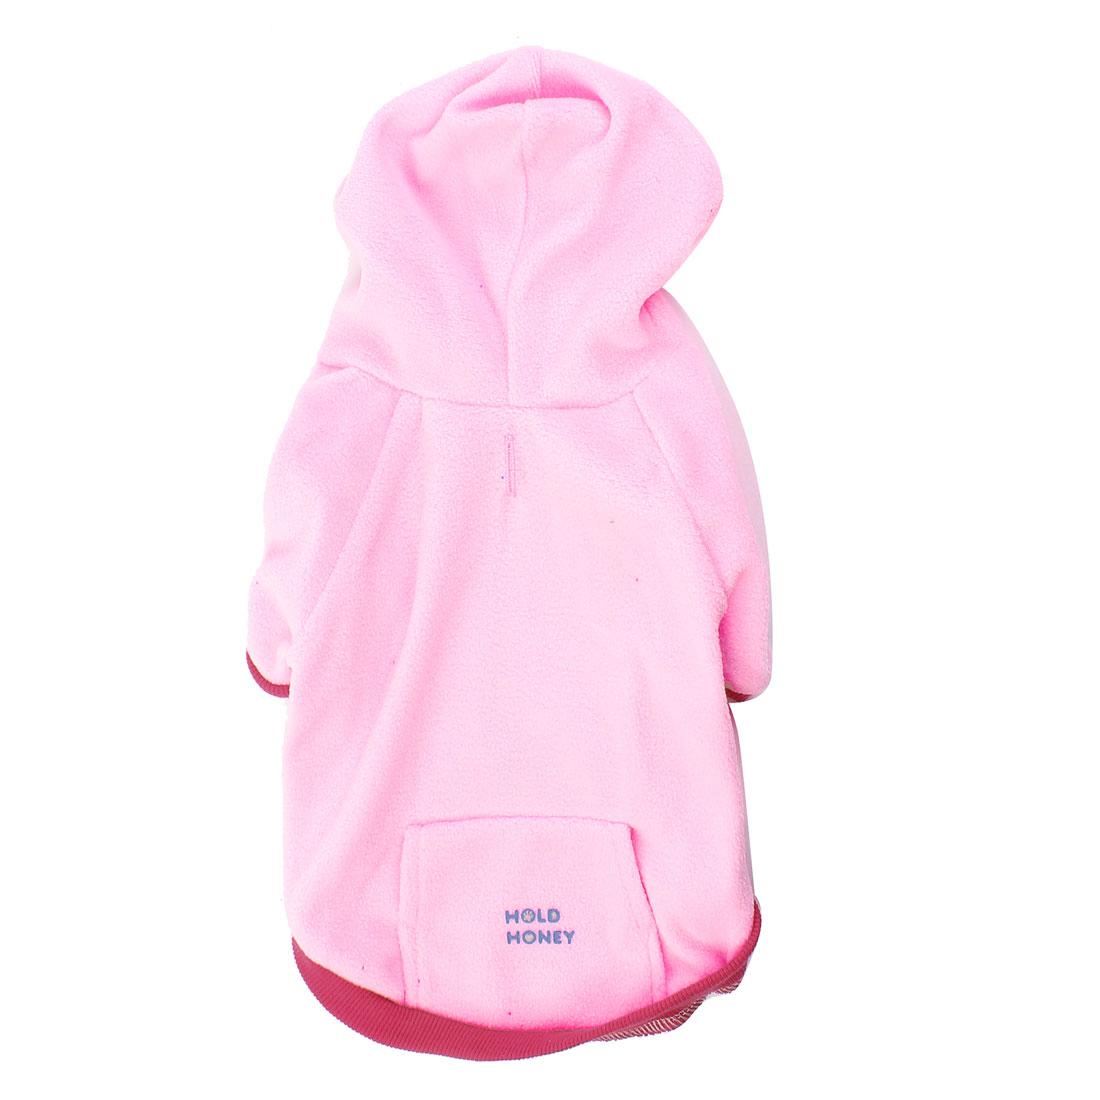 Winter Warm Fleece Raglan Sleeve Pet Dog Doggy Coat Clothing Pink M